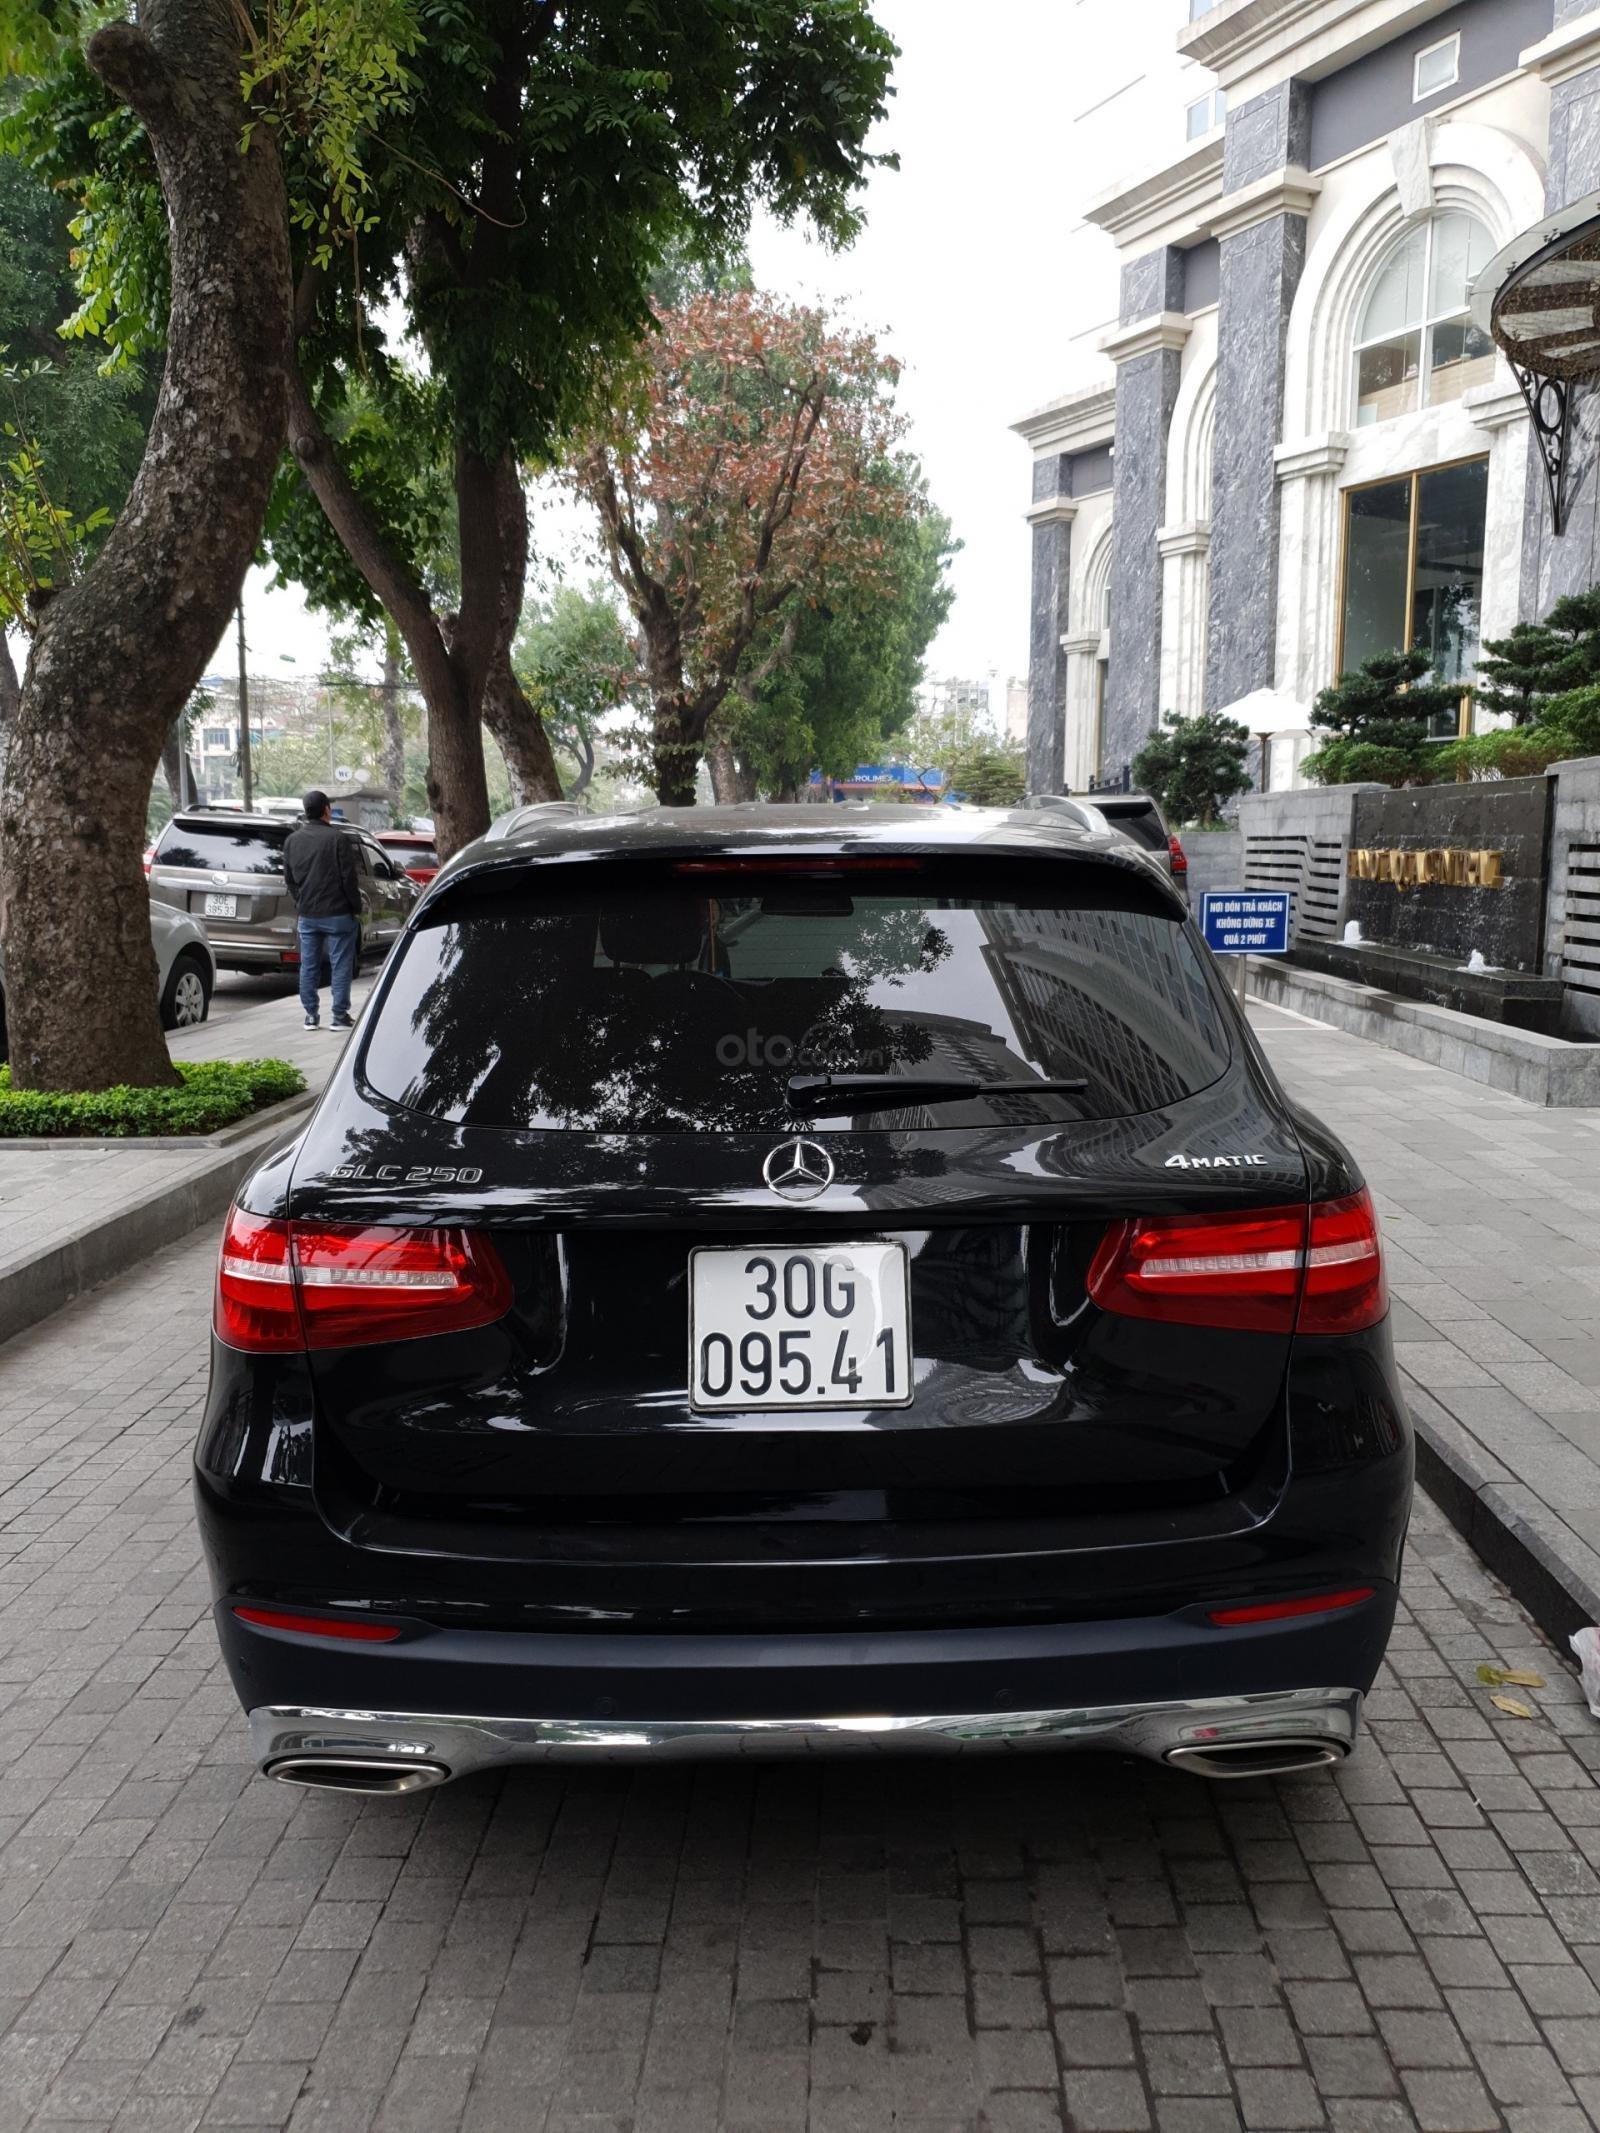 Bán Mercedes Benz GLC 250 đen nâu 2018 (4)